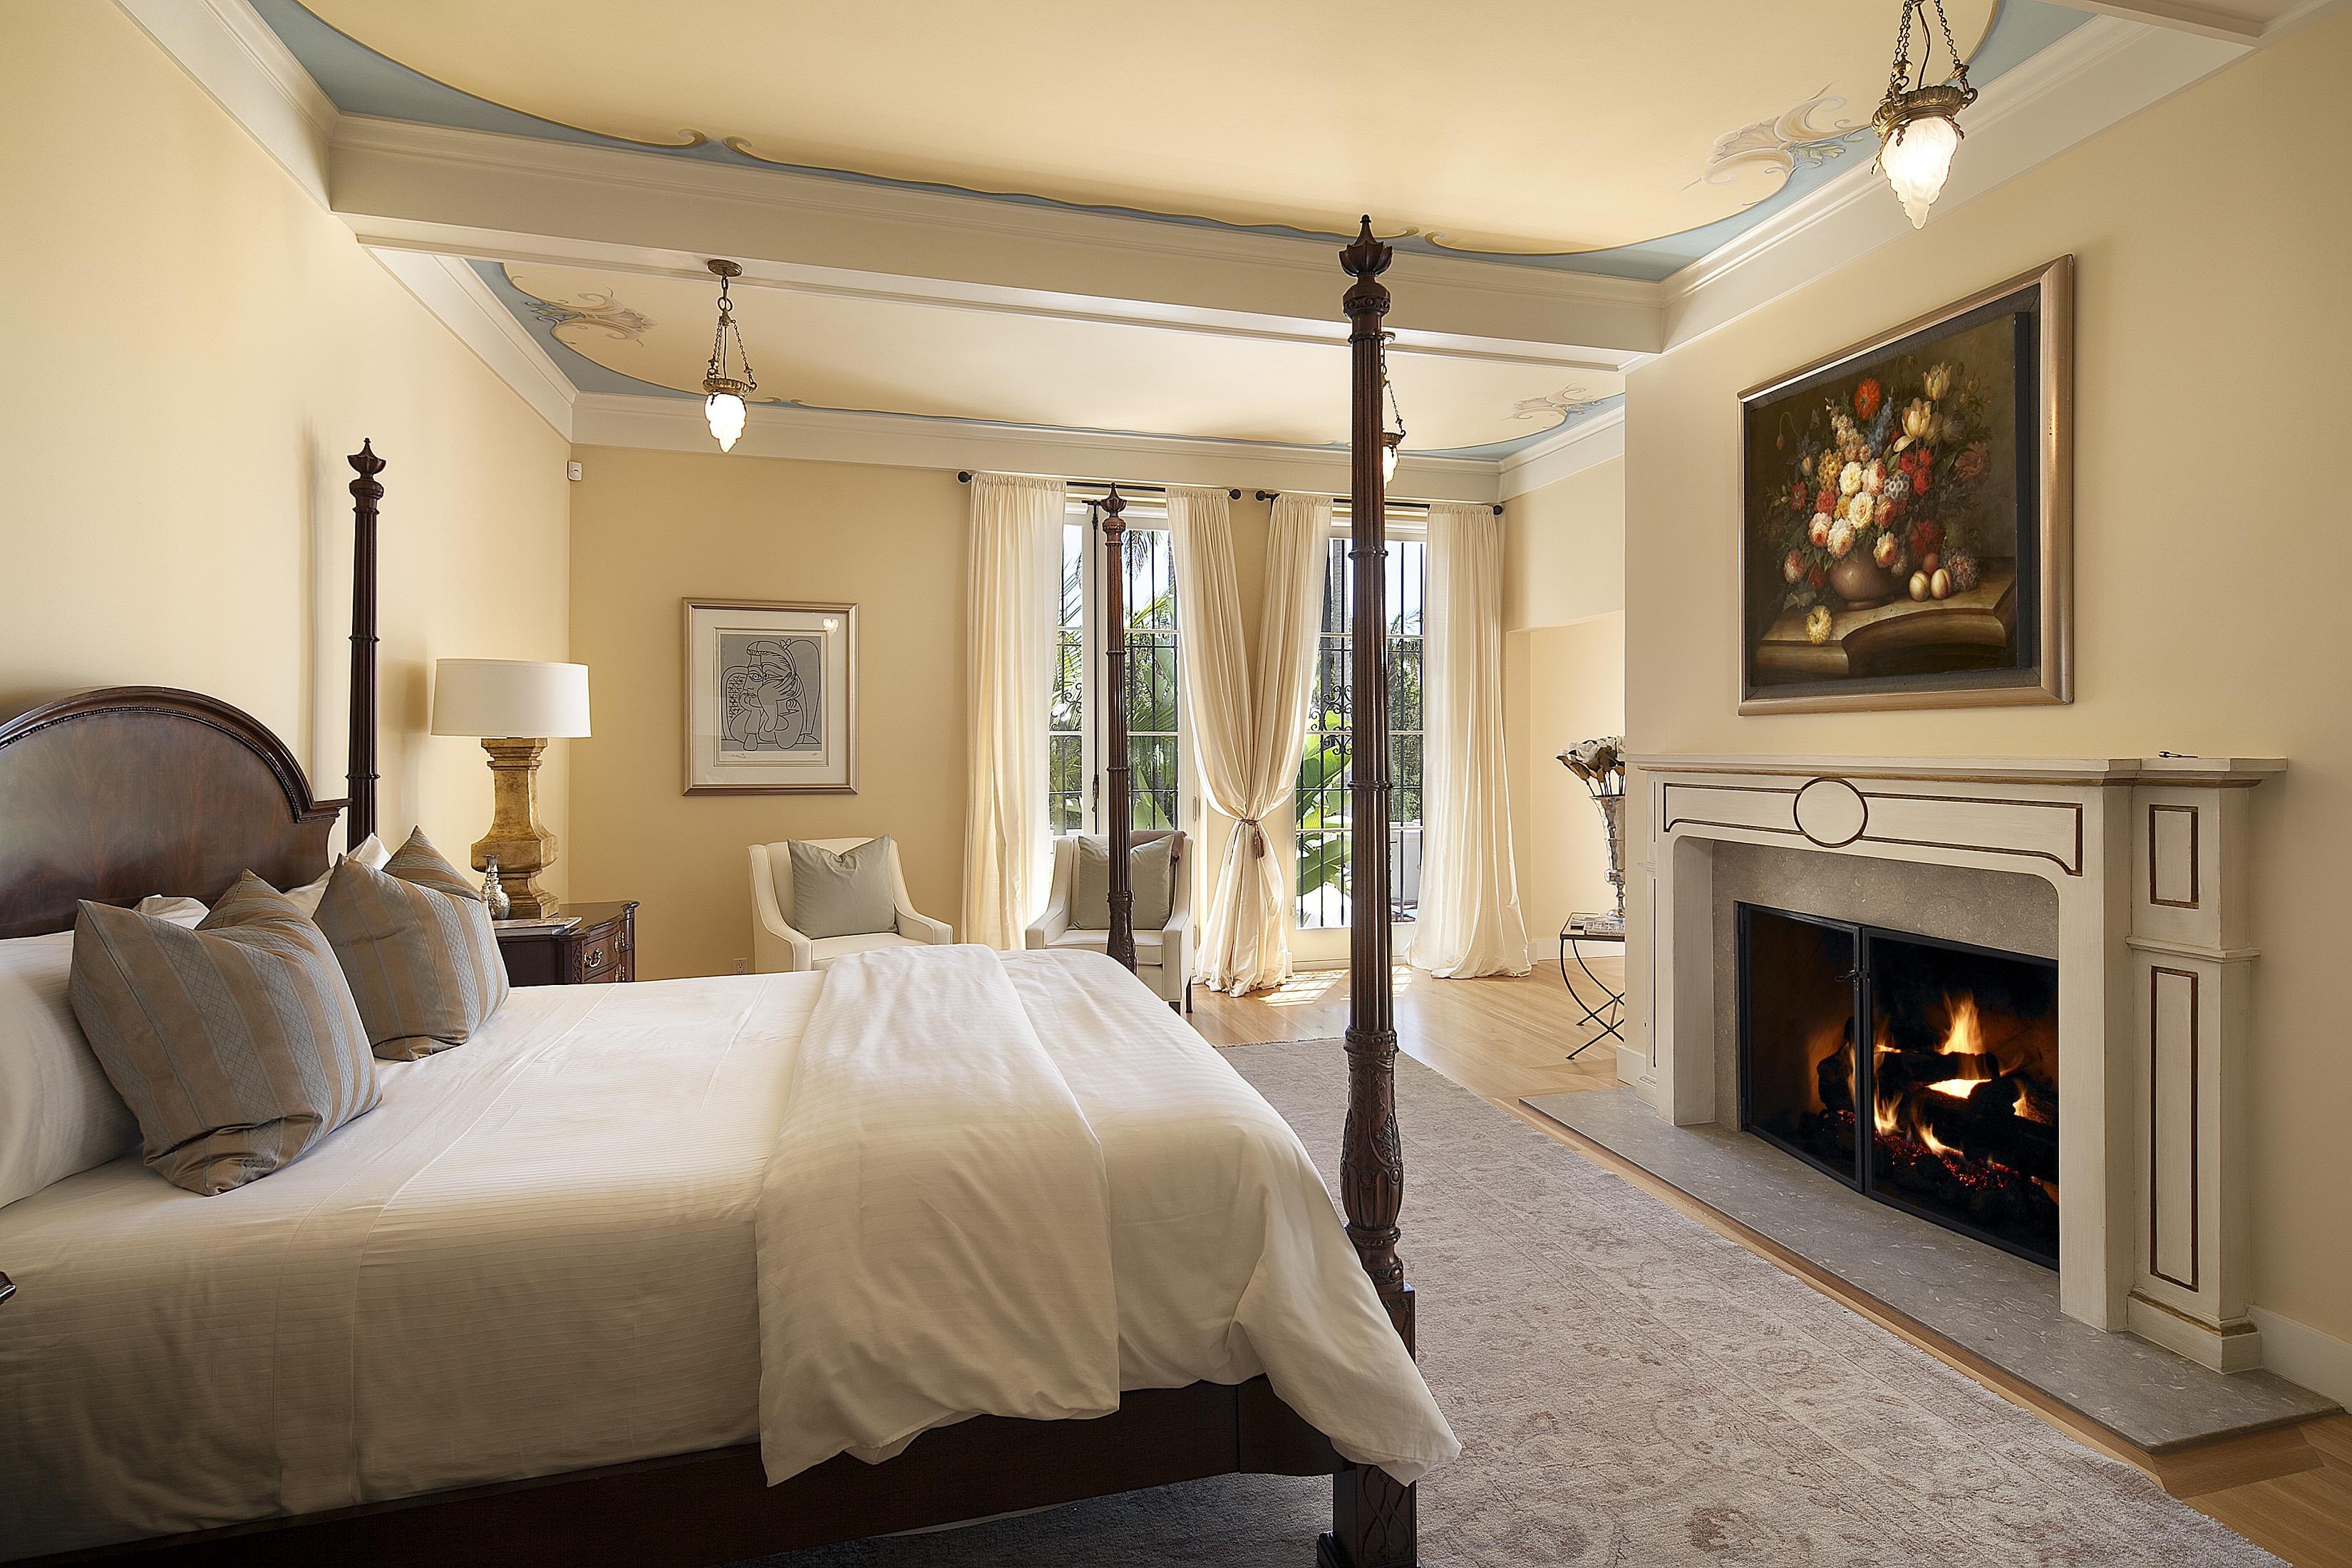 Classy Italian Bedroom Decor Style (View 7 of 12)